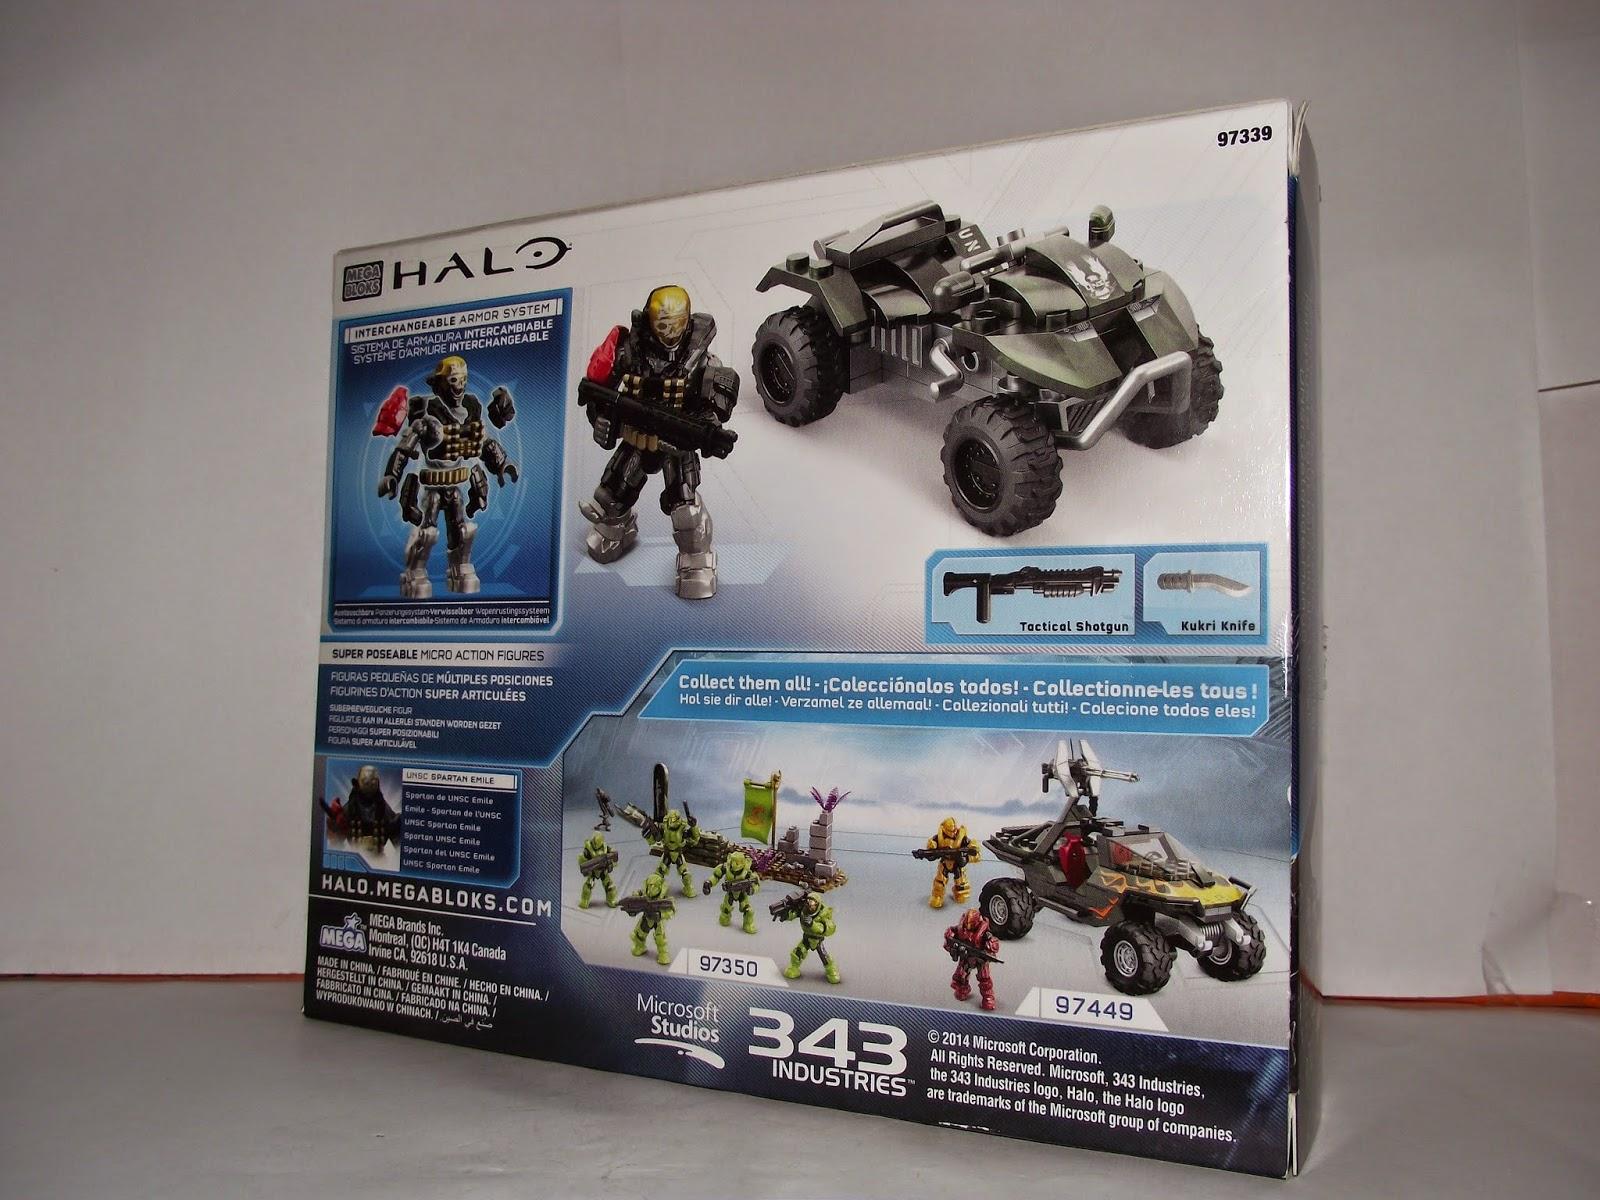 Go Figure!: Halo Mega Bloks 97339 UNSC All-Terain Mongoose